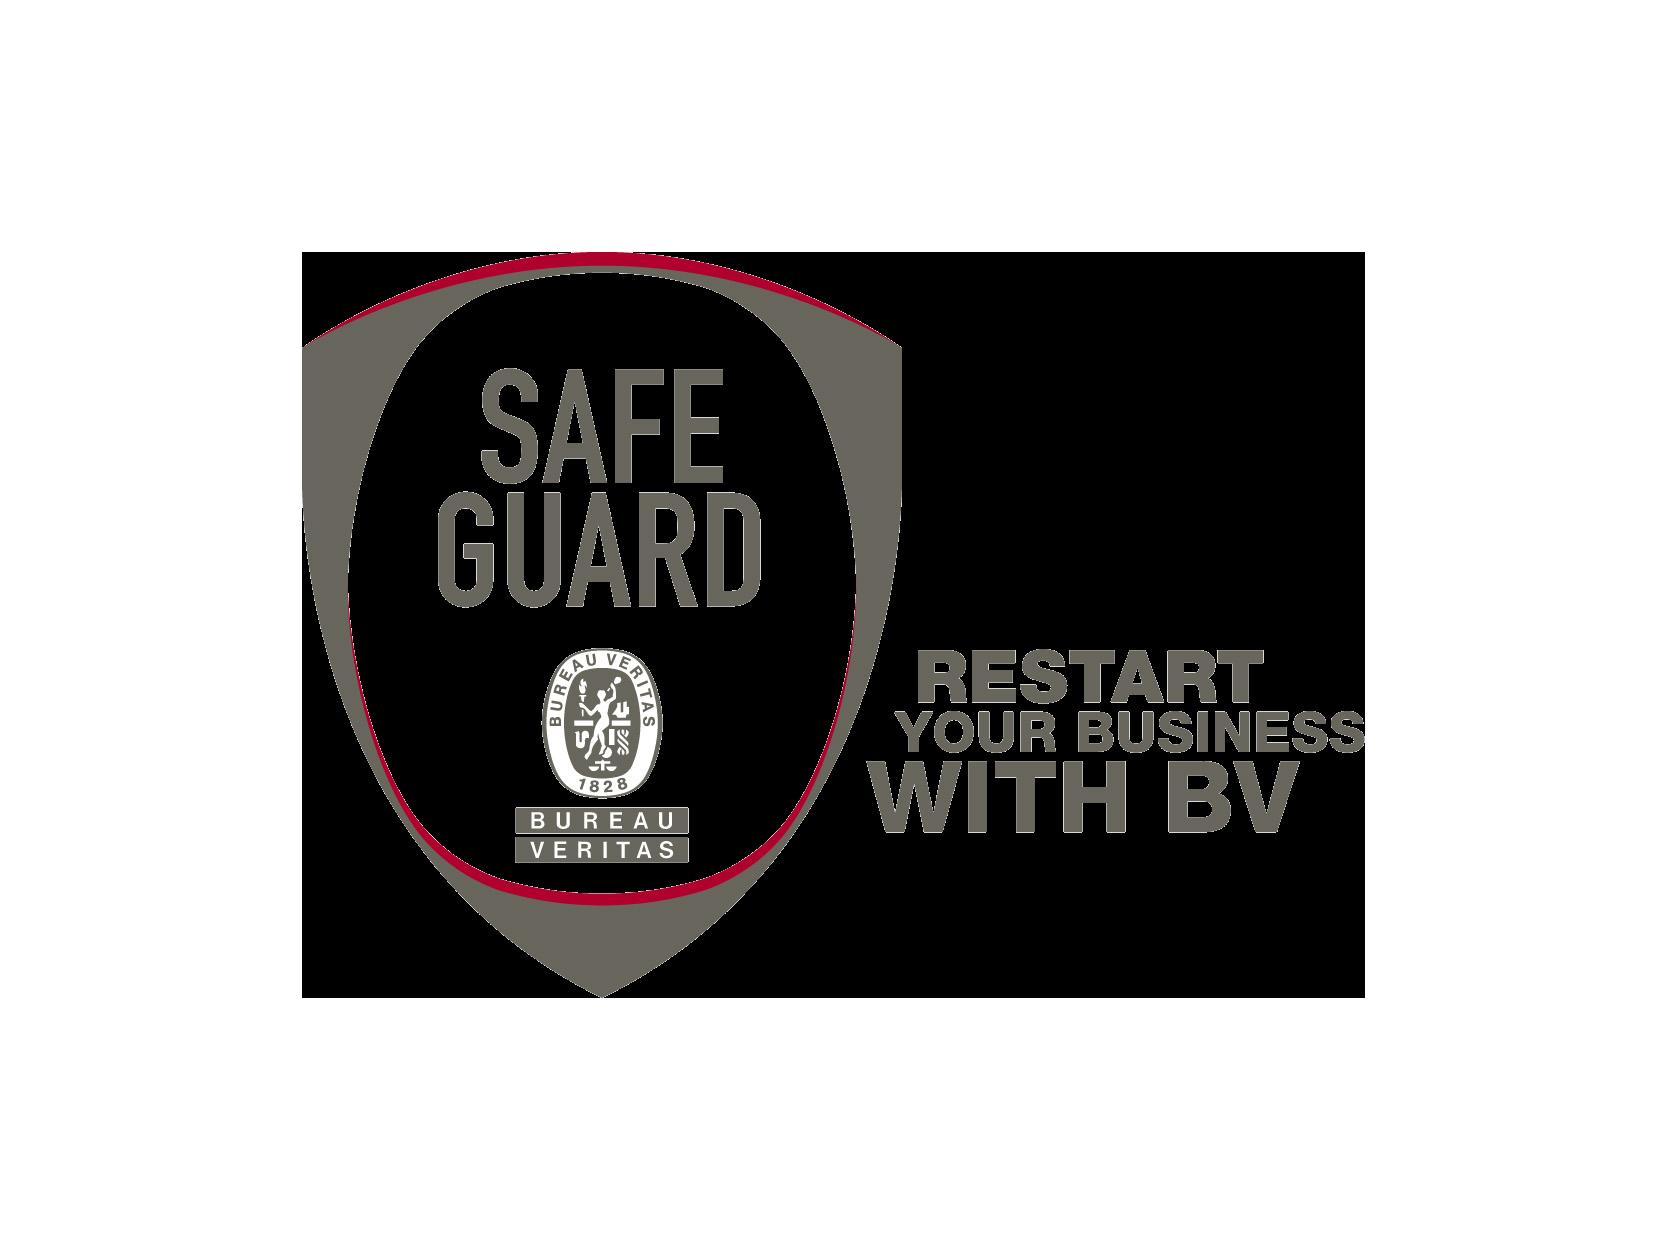 Restart Your Business Safeguard Logo Bureau Veritas